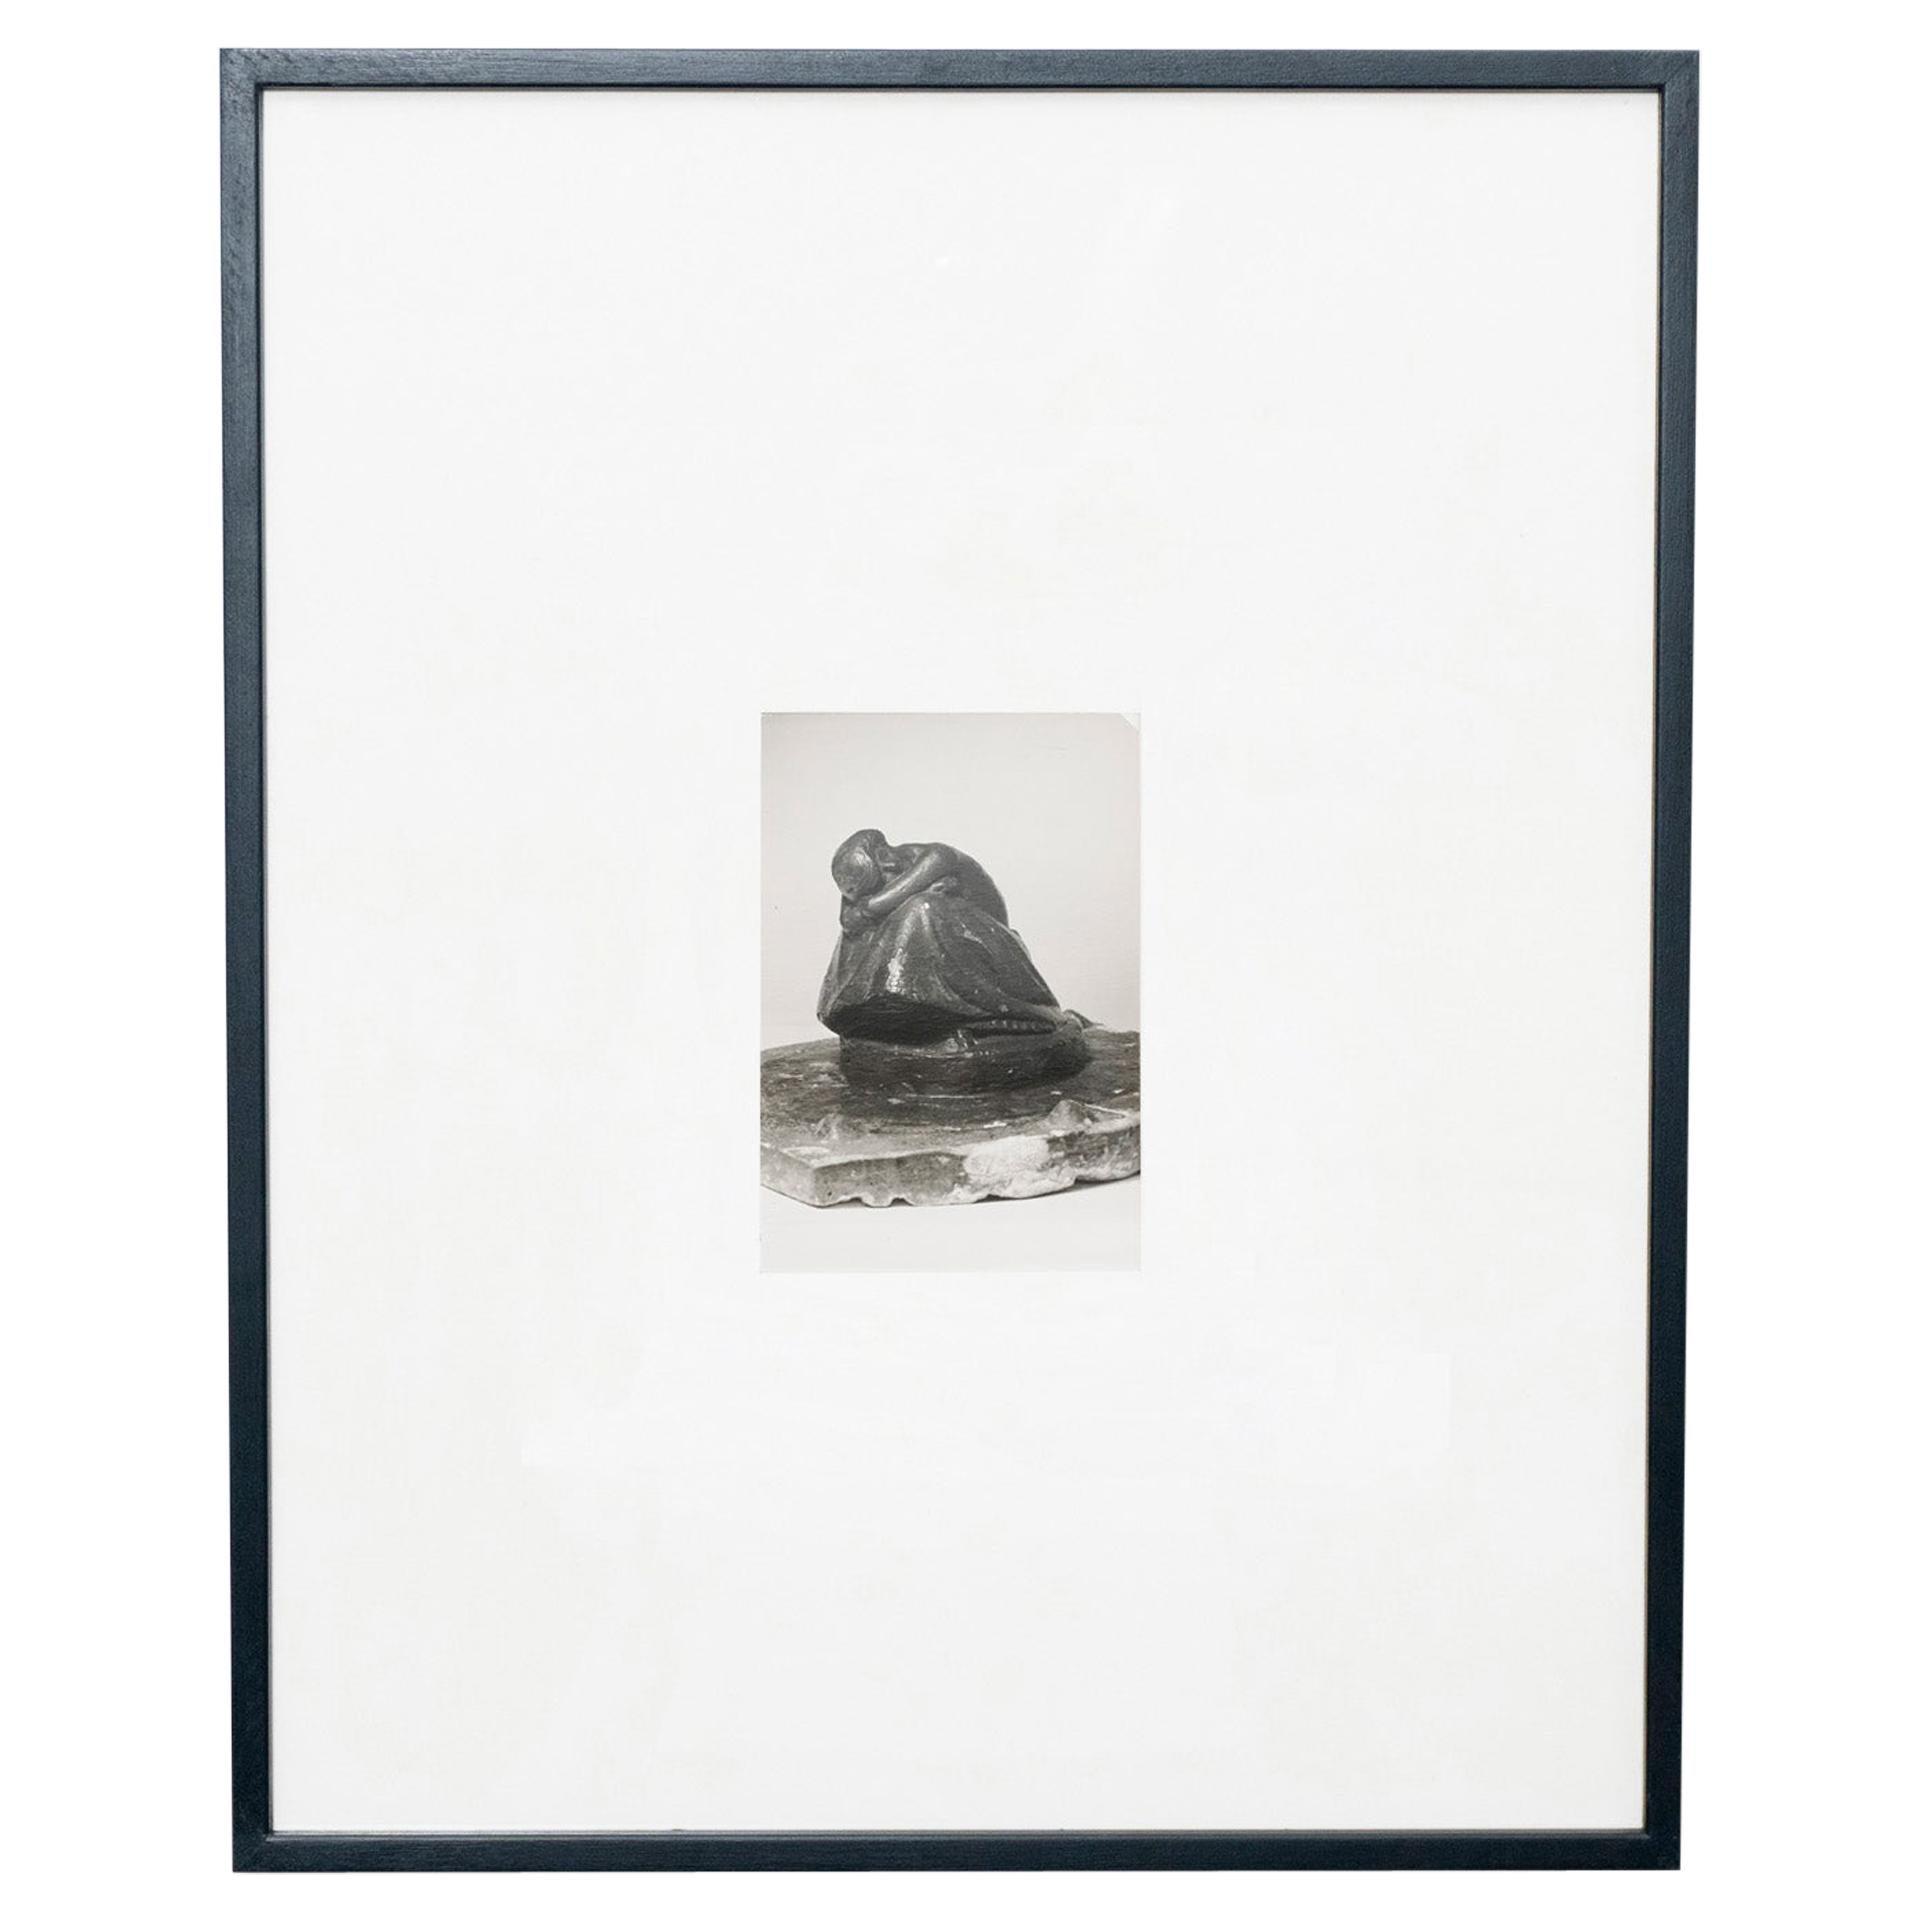 Manolo Hugue Archive Photography of Sculpture, circa 1960